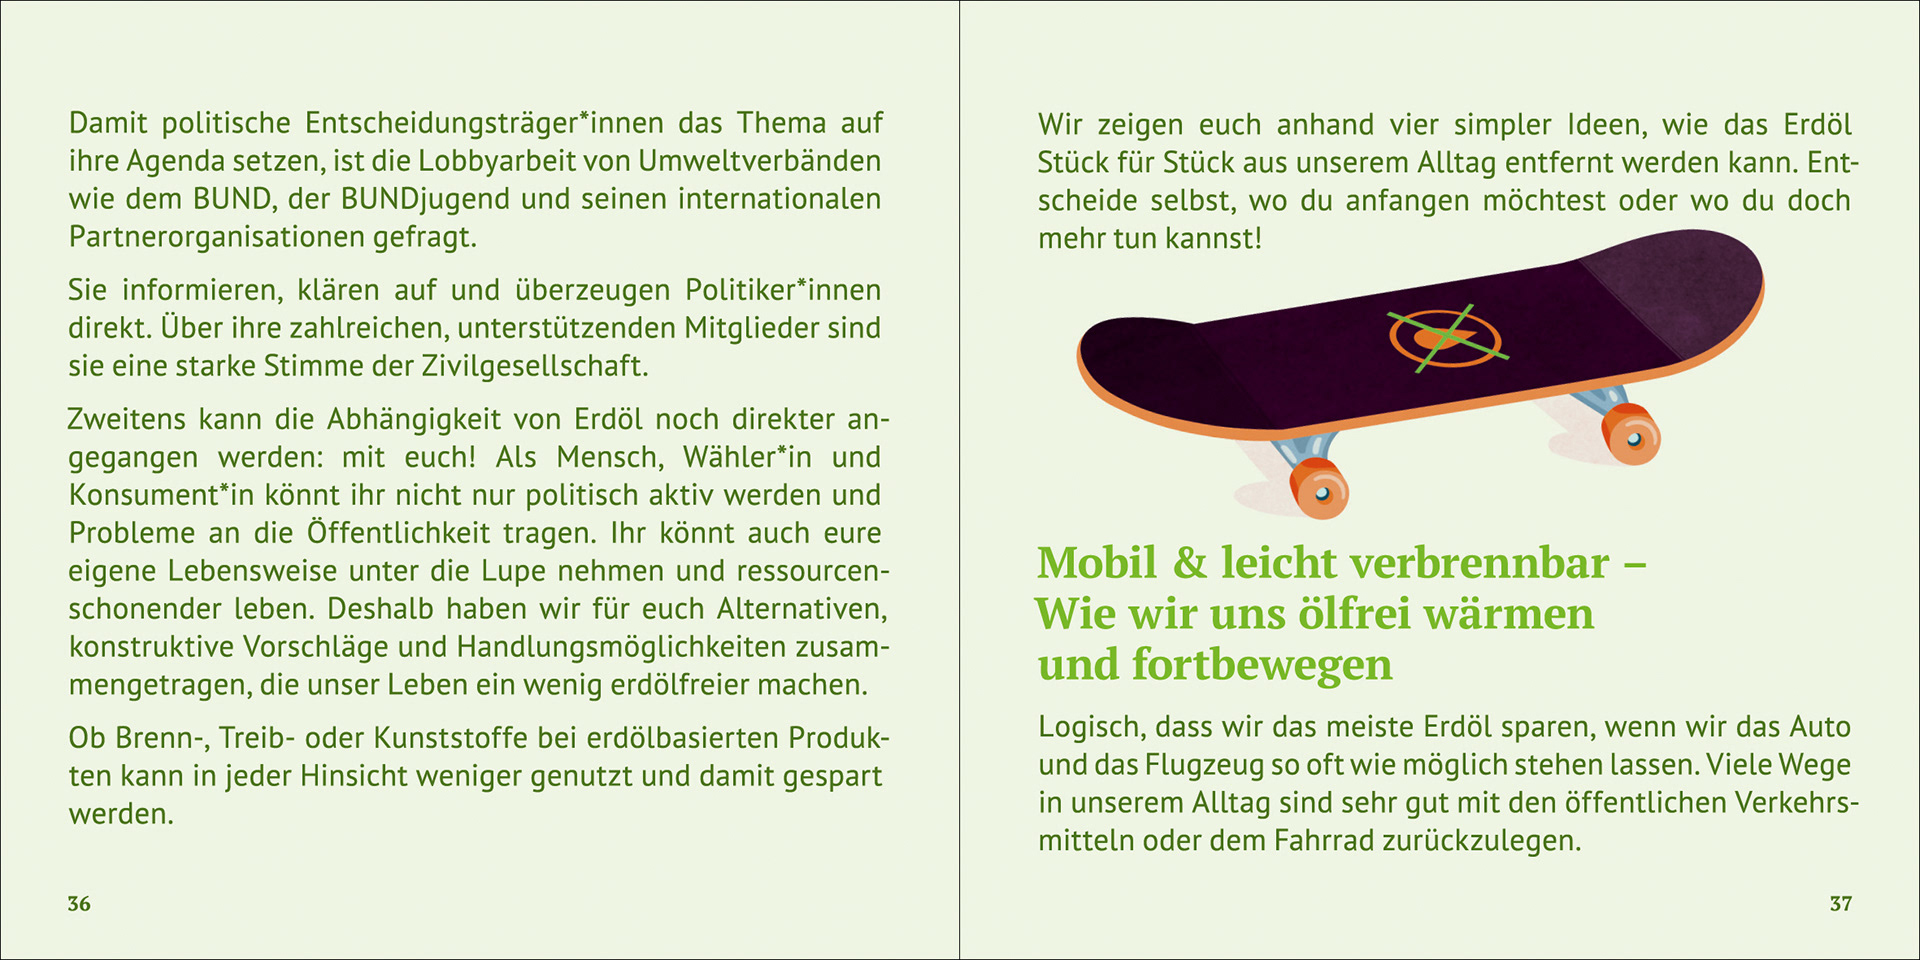 Annika Huskamp Illustration - Ölwechsel! / leaflet illustration